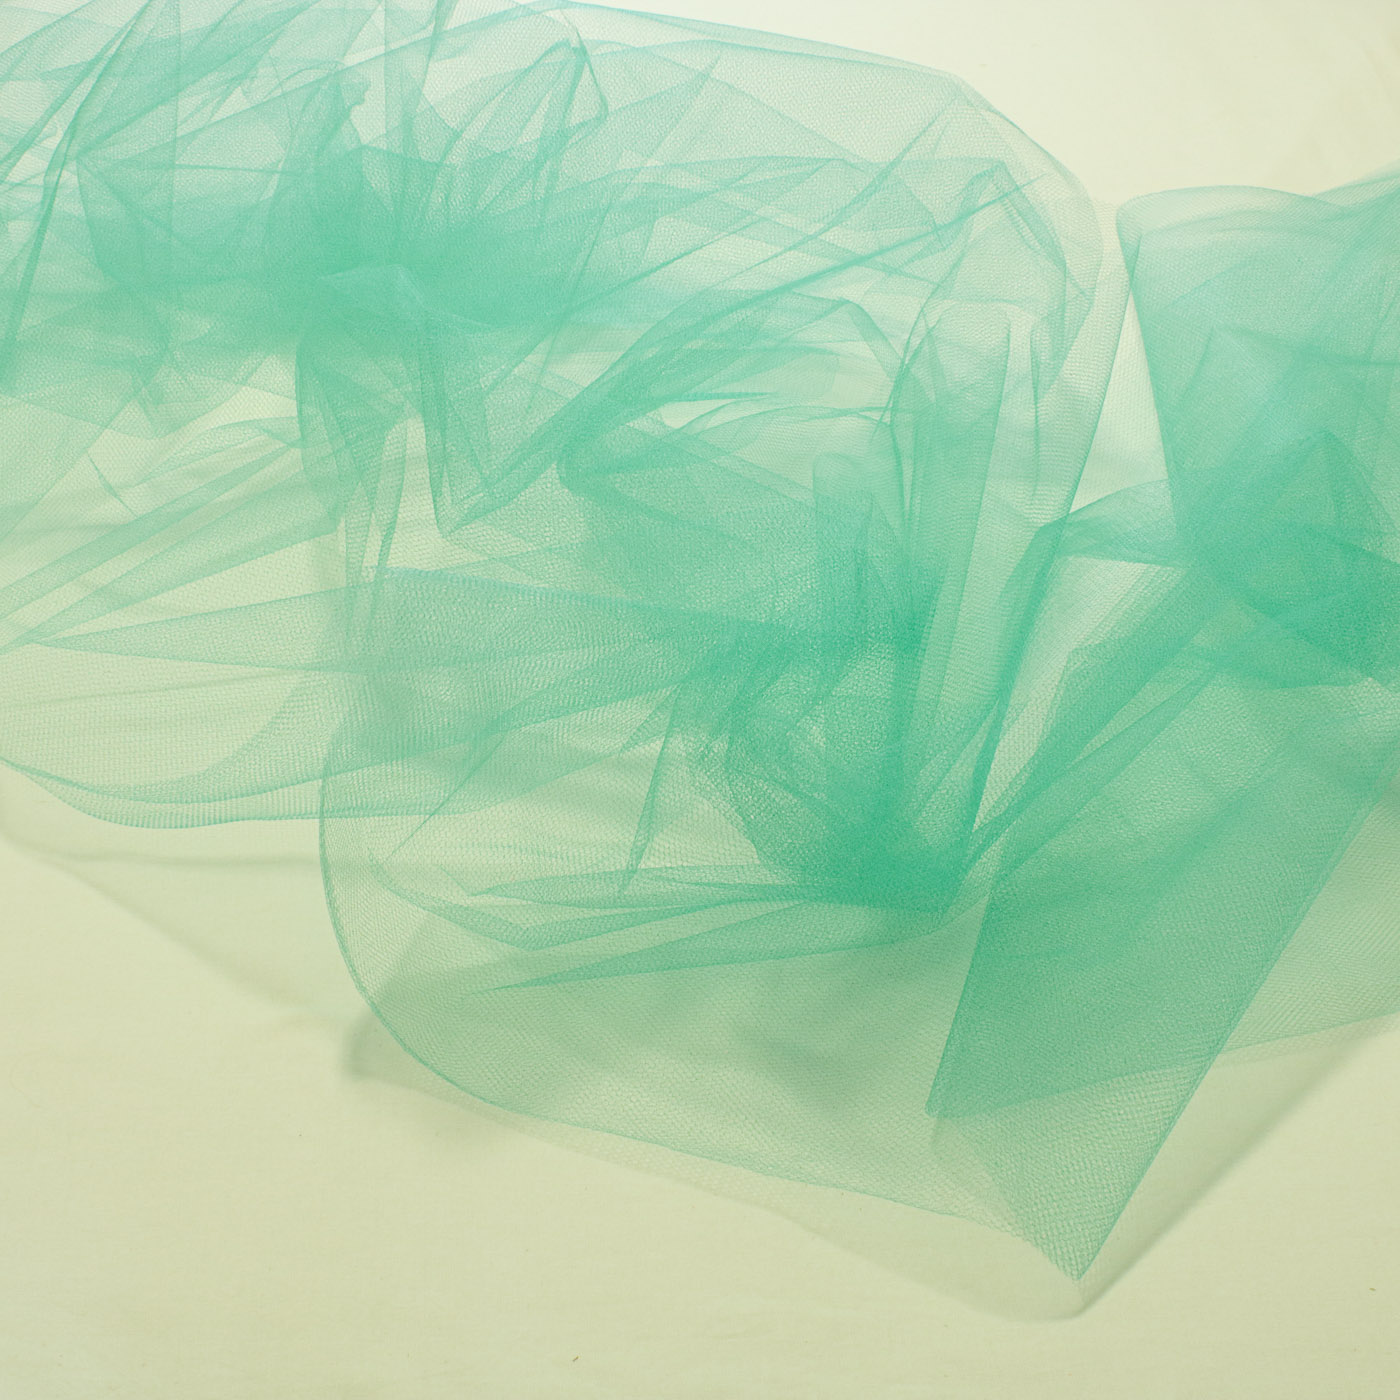 Tecido Tule 100% Poliester 1,20 Mt Largura 123 Verde Tiffany